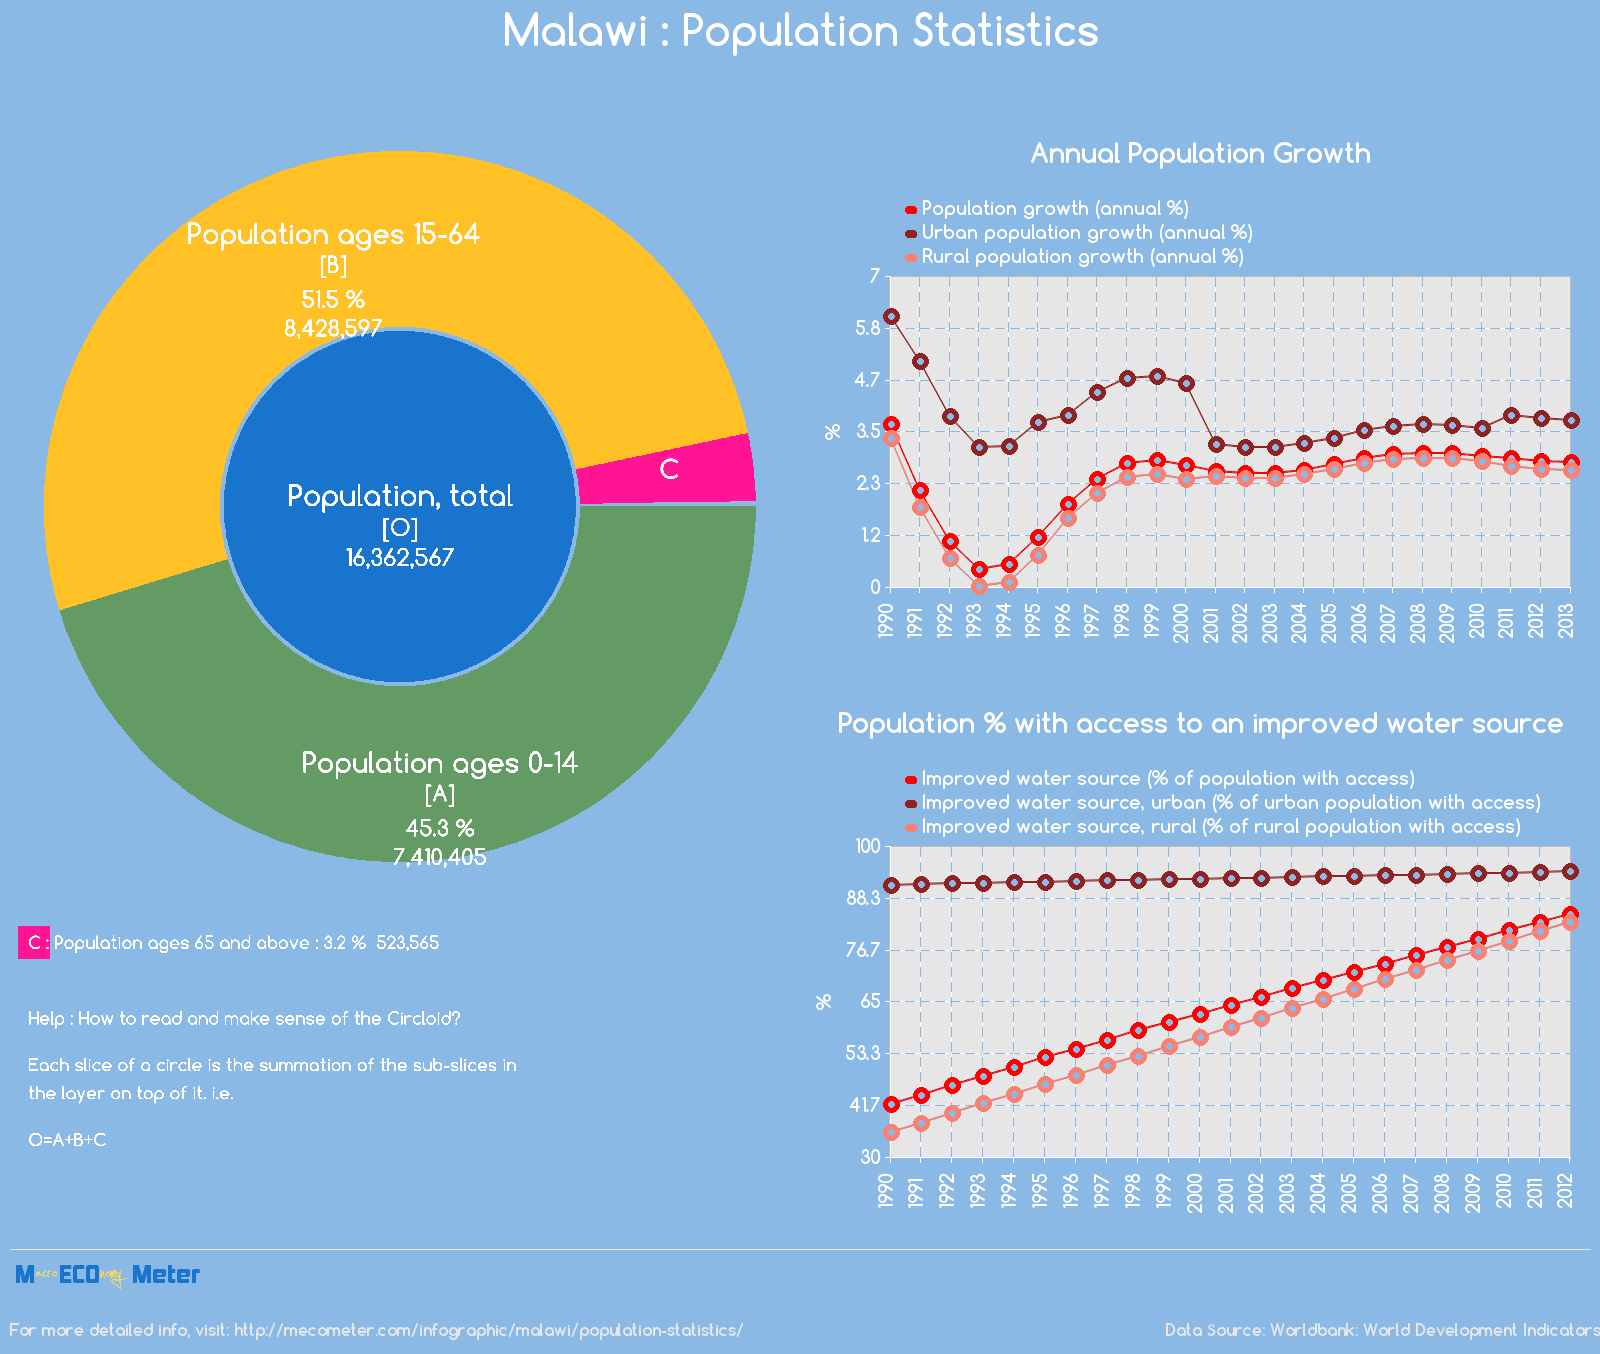 Malawi : Population Statistics